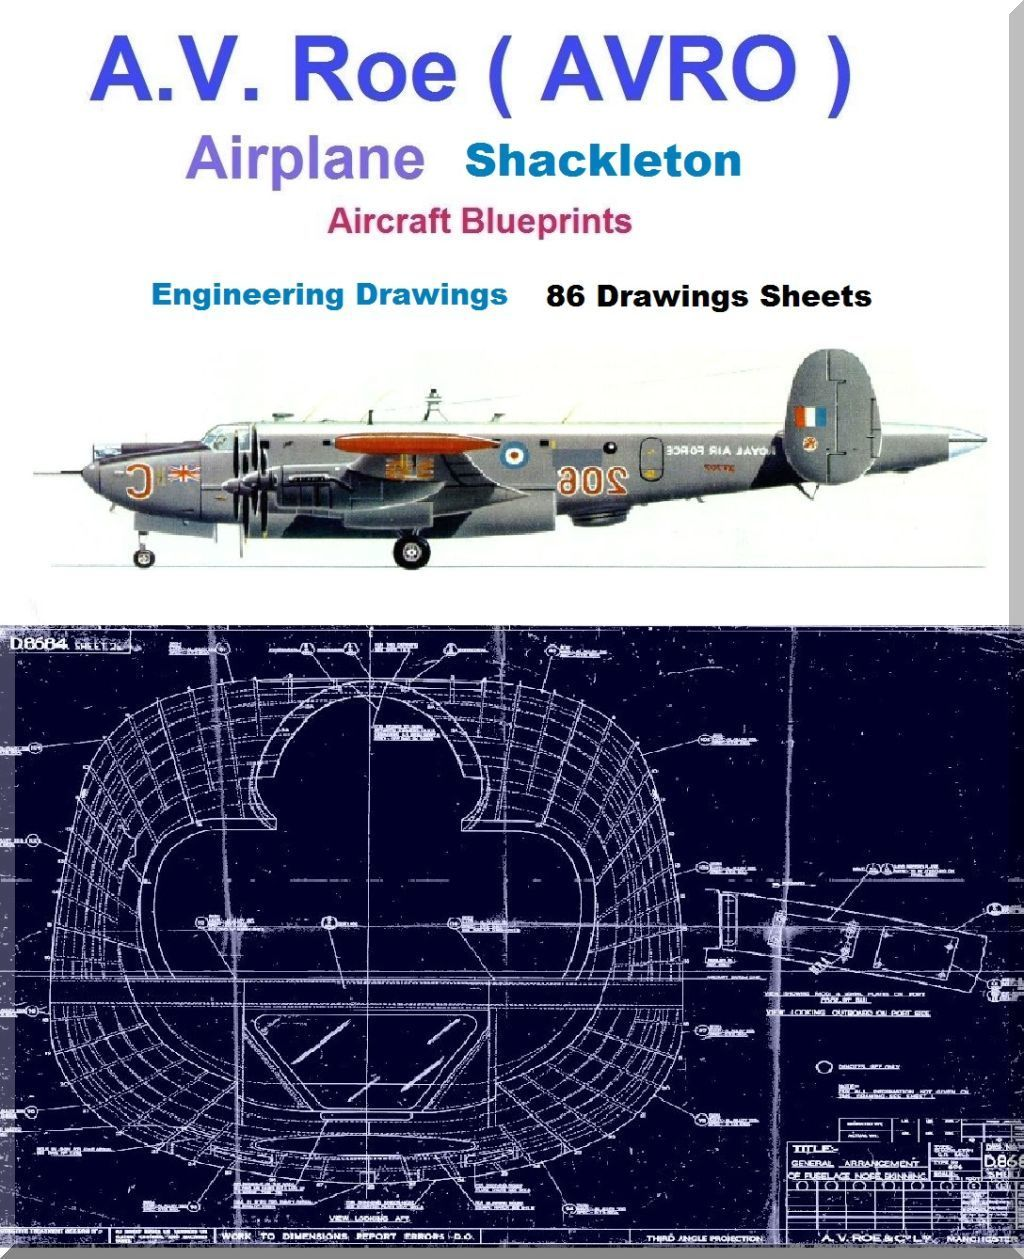 Avro shackleton mr2 aircraft blueprints engineering drawings avro shackleton mr2 aircraft blueprints engineering drawings download malvernweather Choice Image